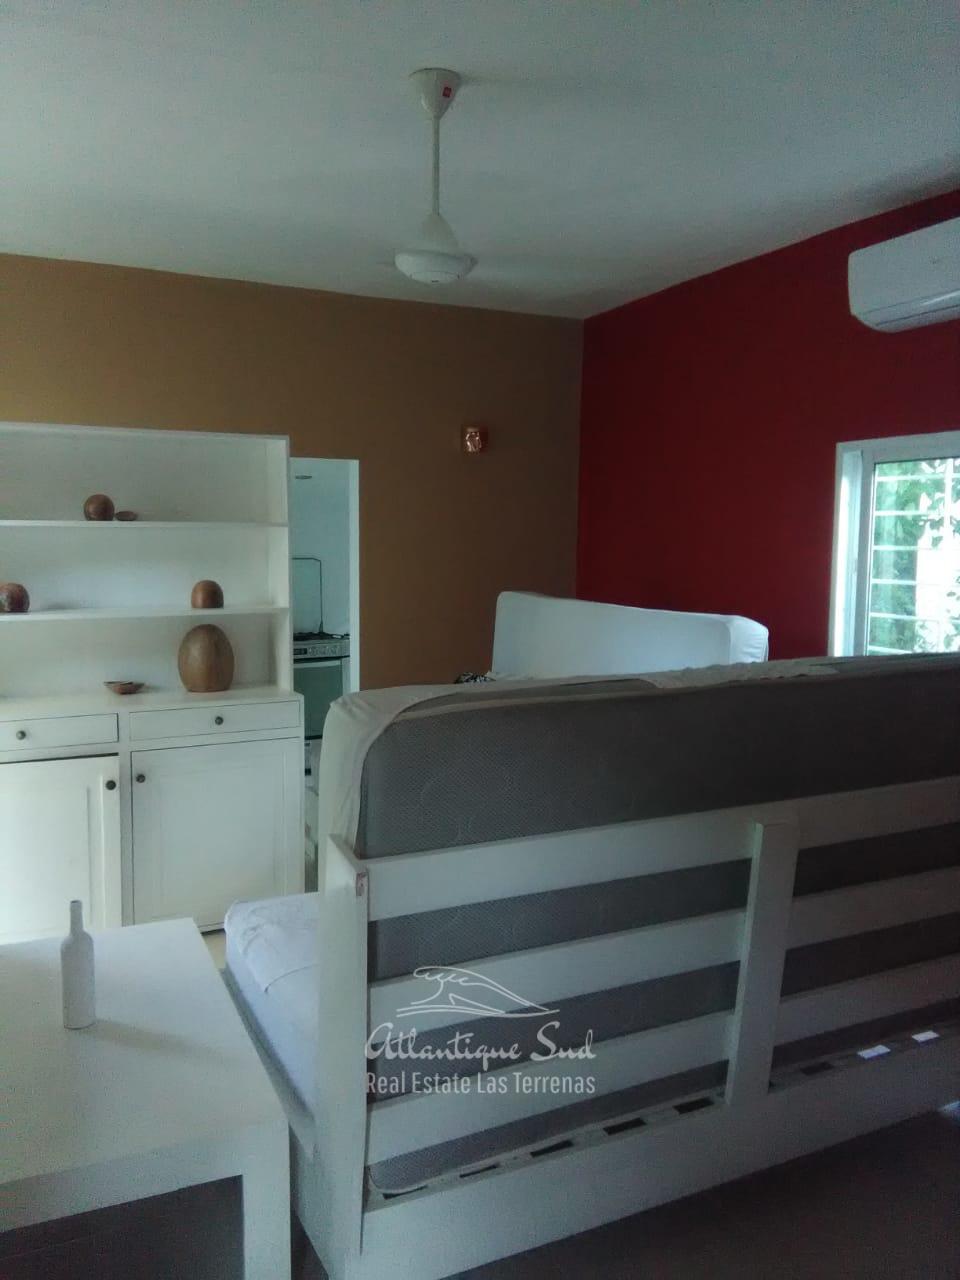 Hotel for sale steps from te beach Real Estate Las Terrenas Atlantique Sud Dominican Republic3.jpeg